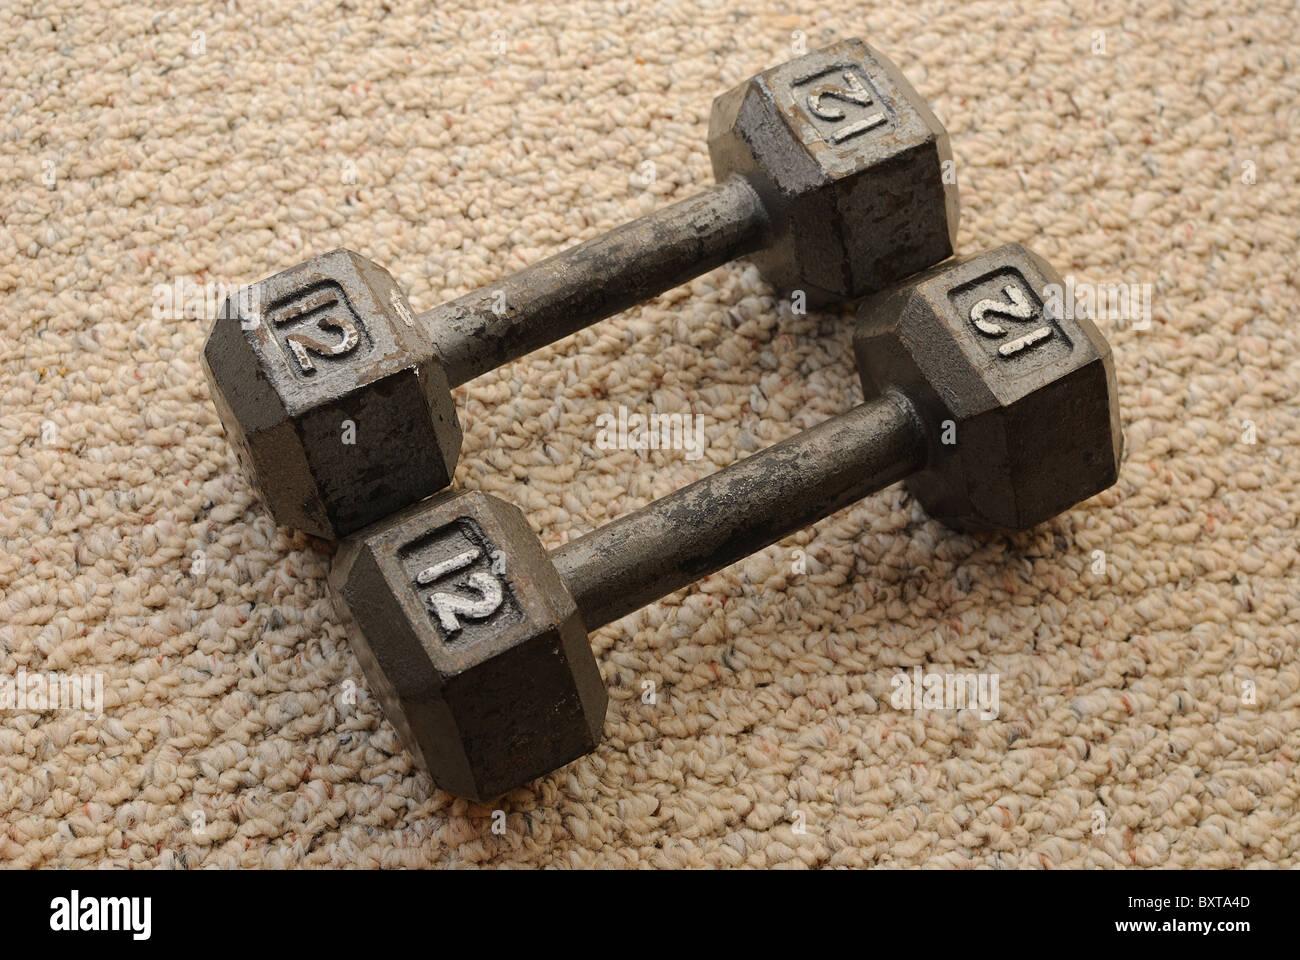 12 pound dumb bells on carpet - Stock Image